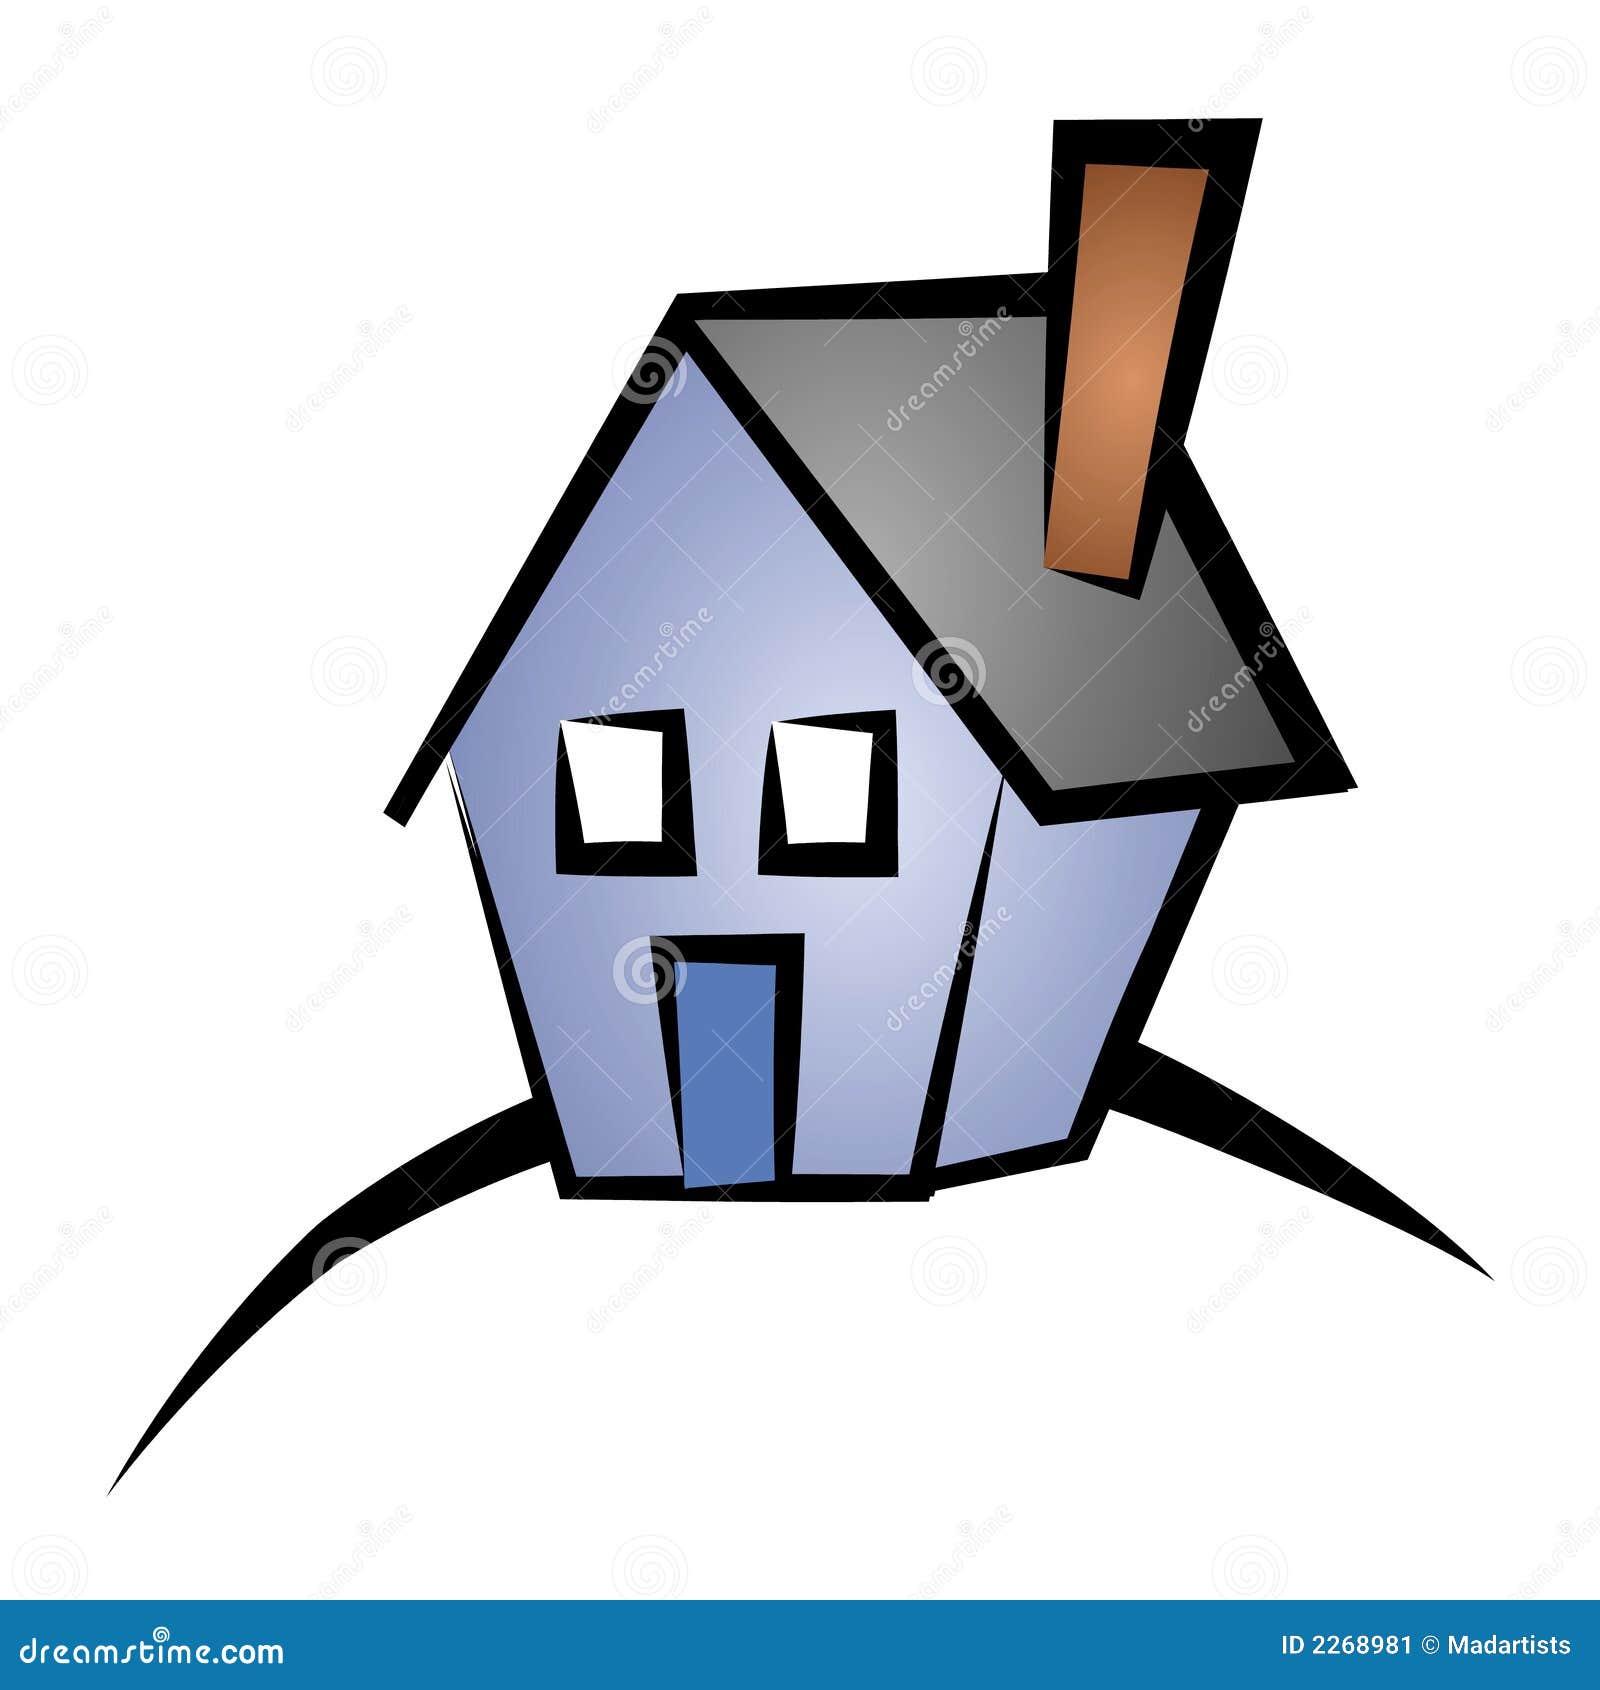 real estate clip art house 4 stock illustration illustration of rh dreamstime com free real estate clipart images Tax Clip Art